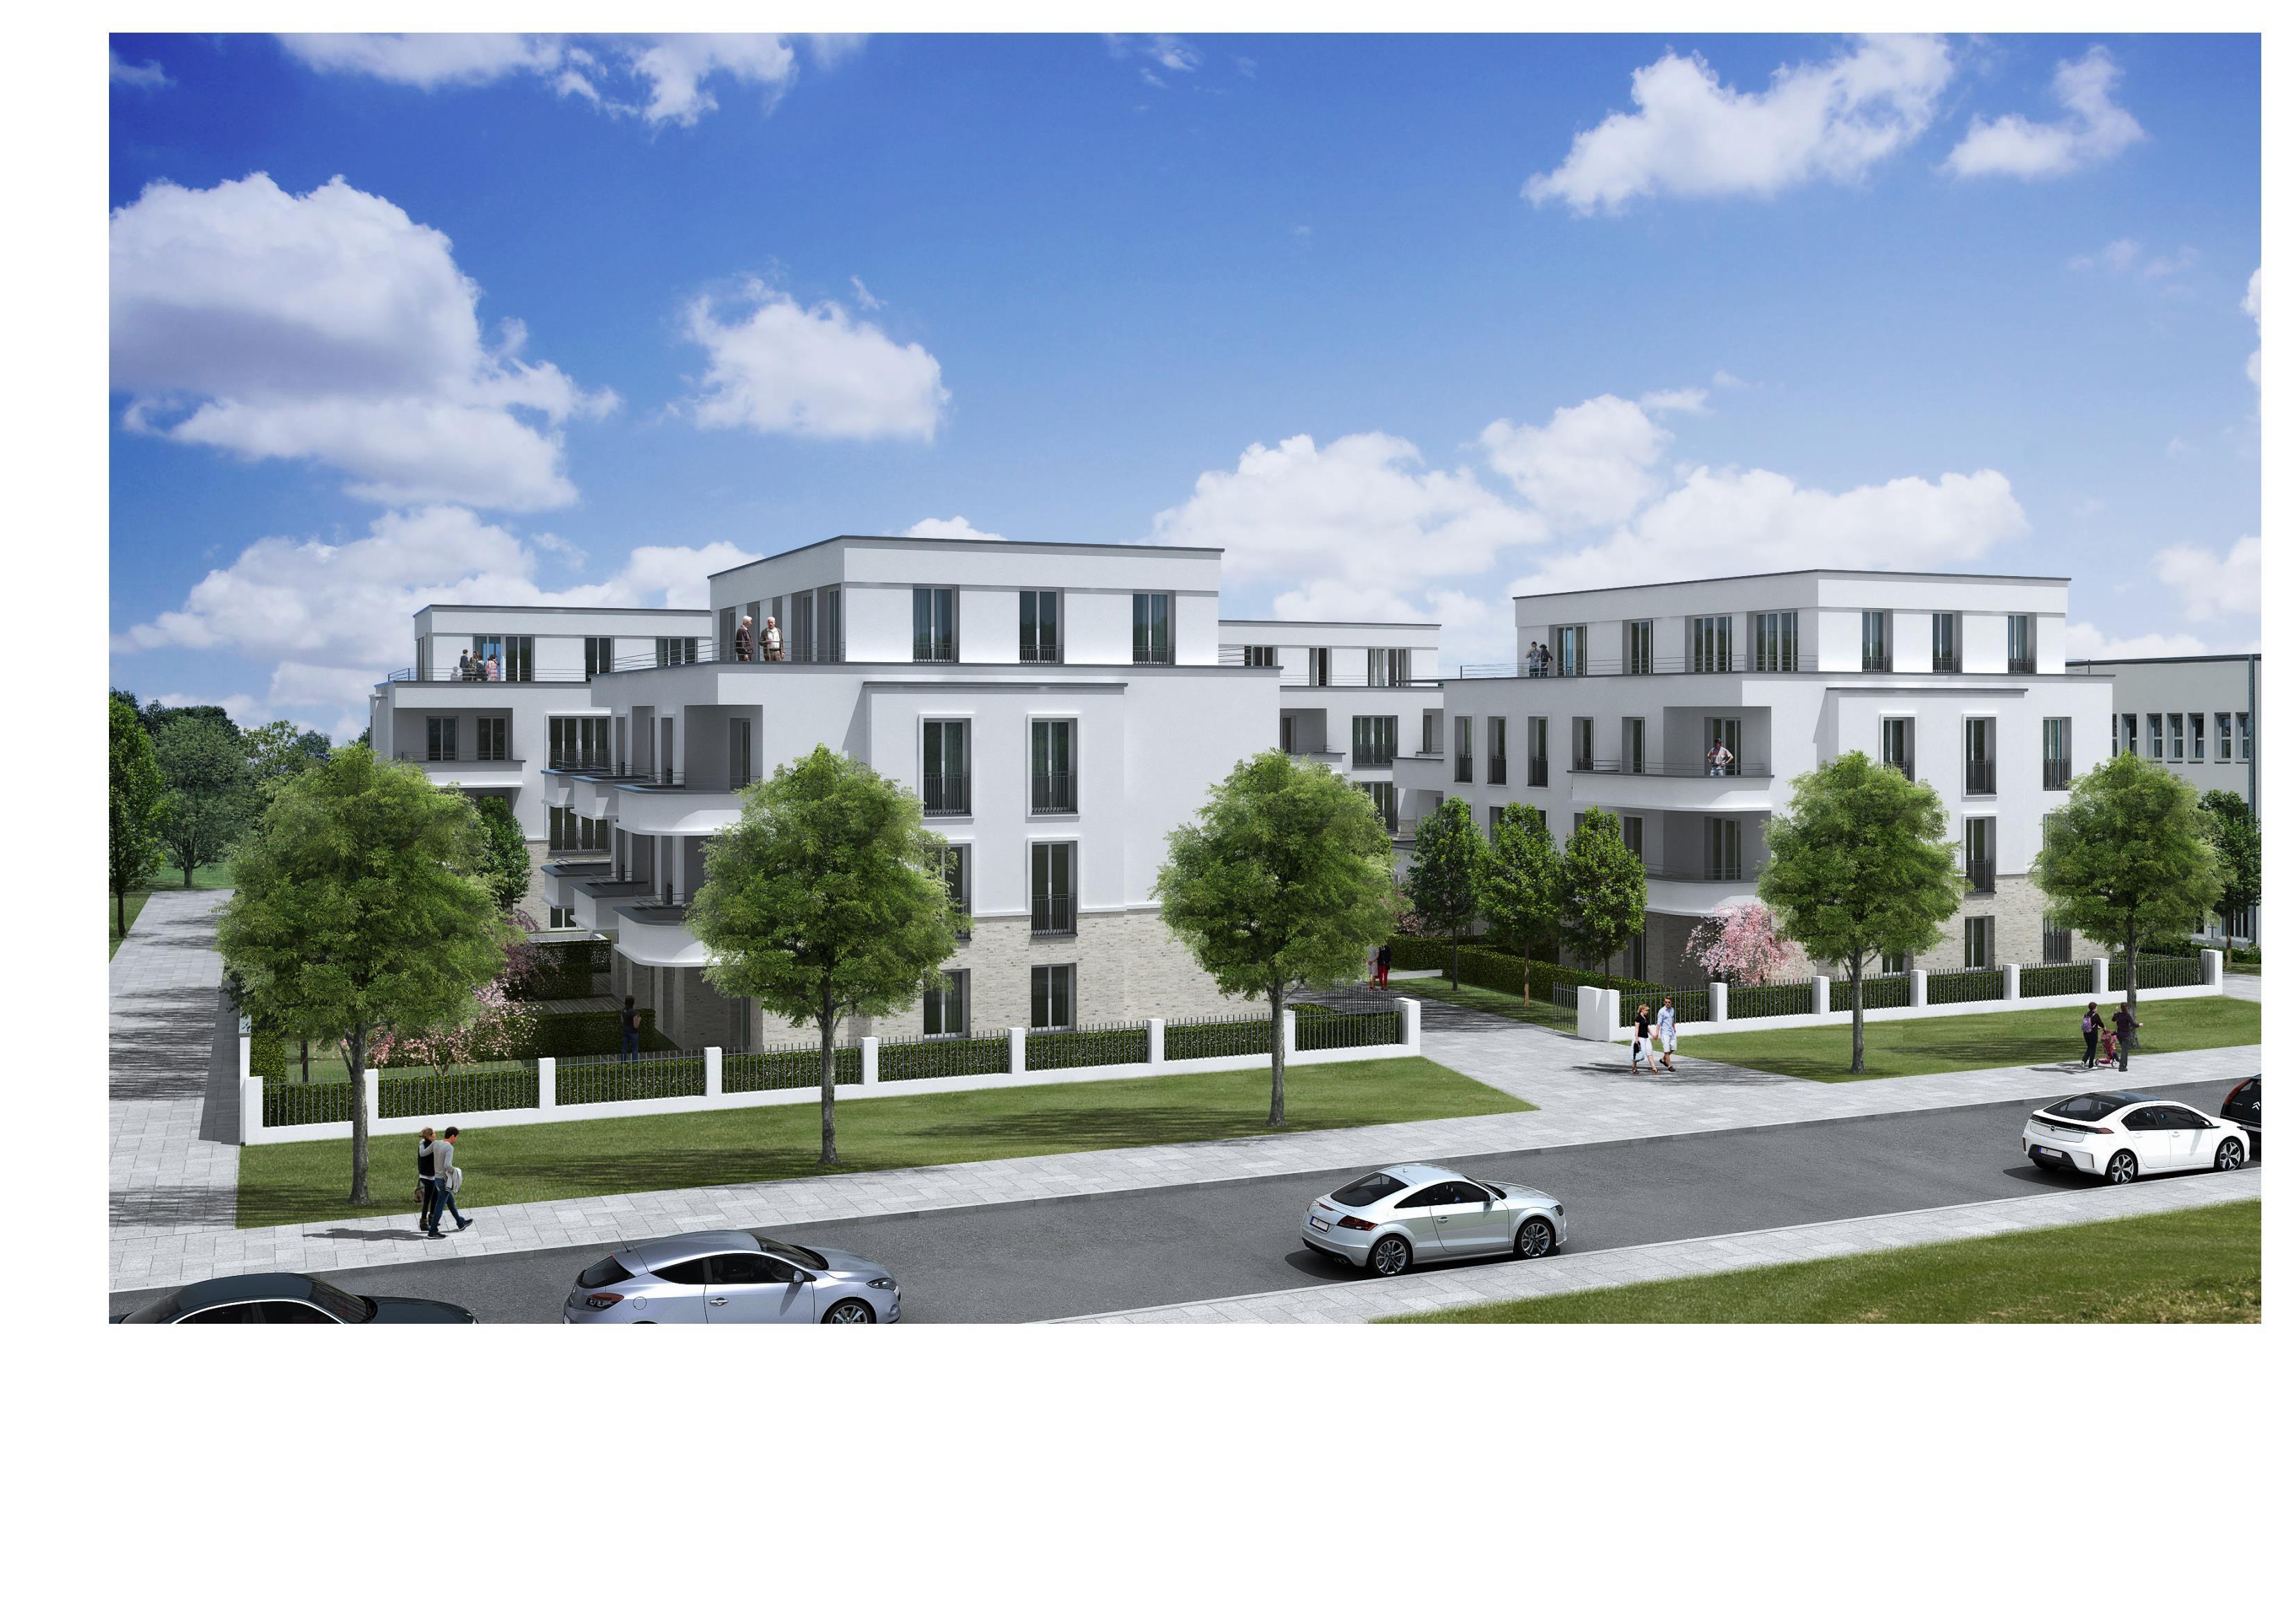 immobilien regensburg neubau wohnungen exklusive top lage. Black Bedroom Furniture Sets. Home Design Ideas